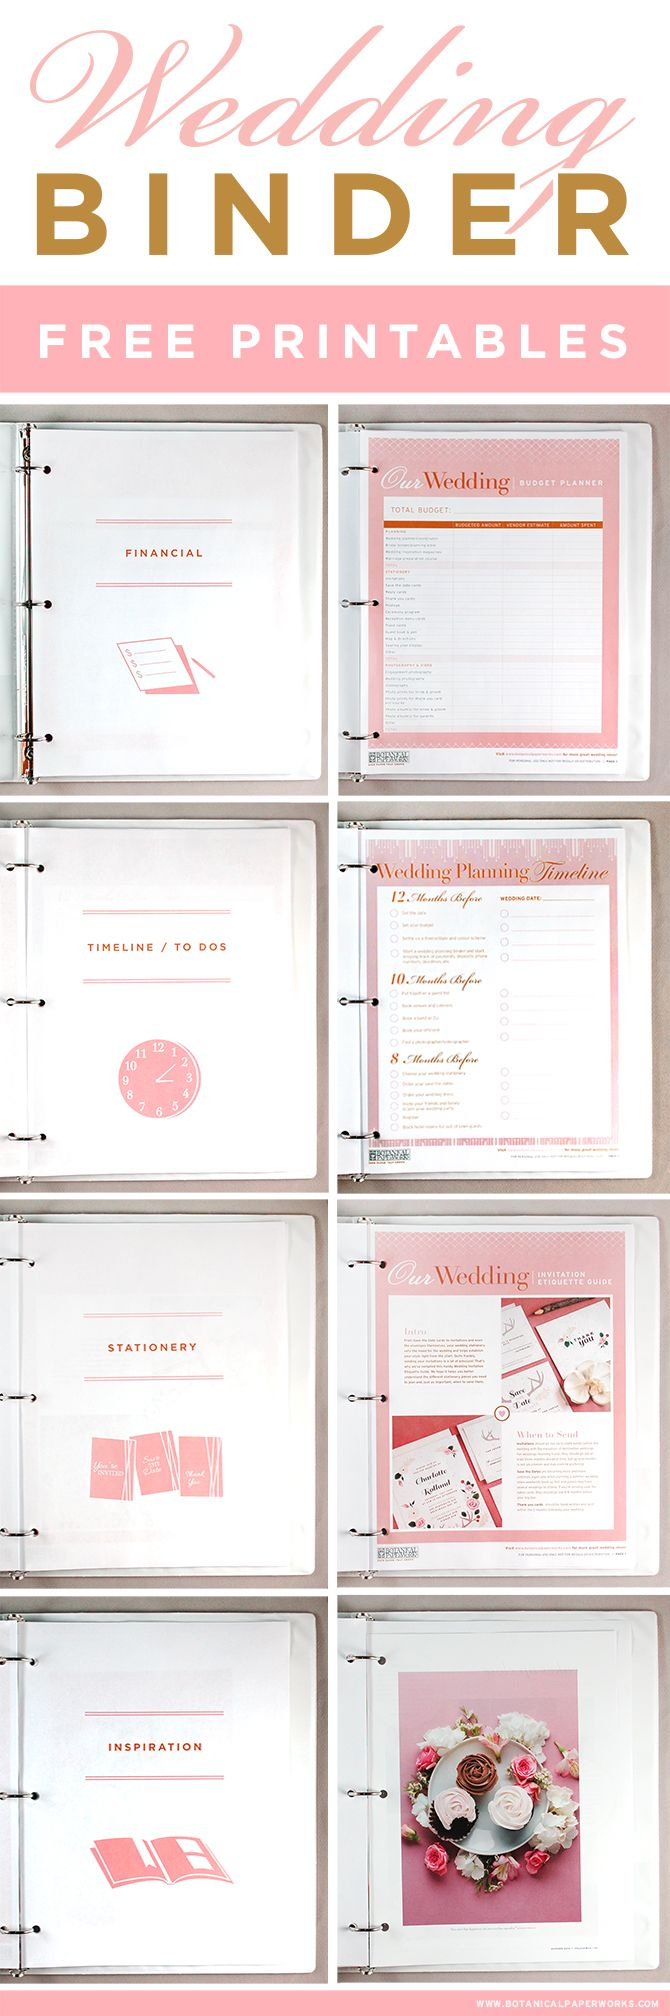 Free Printables} Wedding Planning Binder   Pinterest   Mariages - Free Printable Wedding Planner